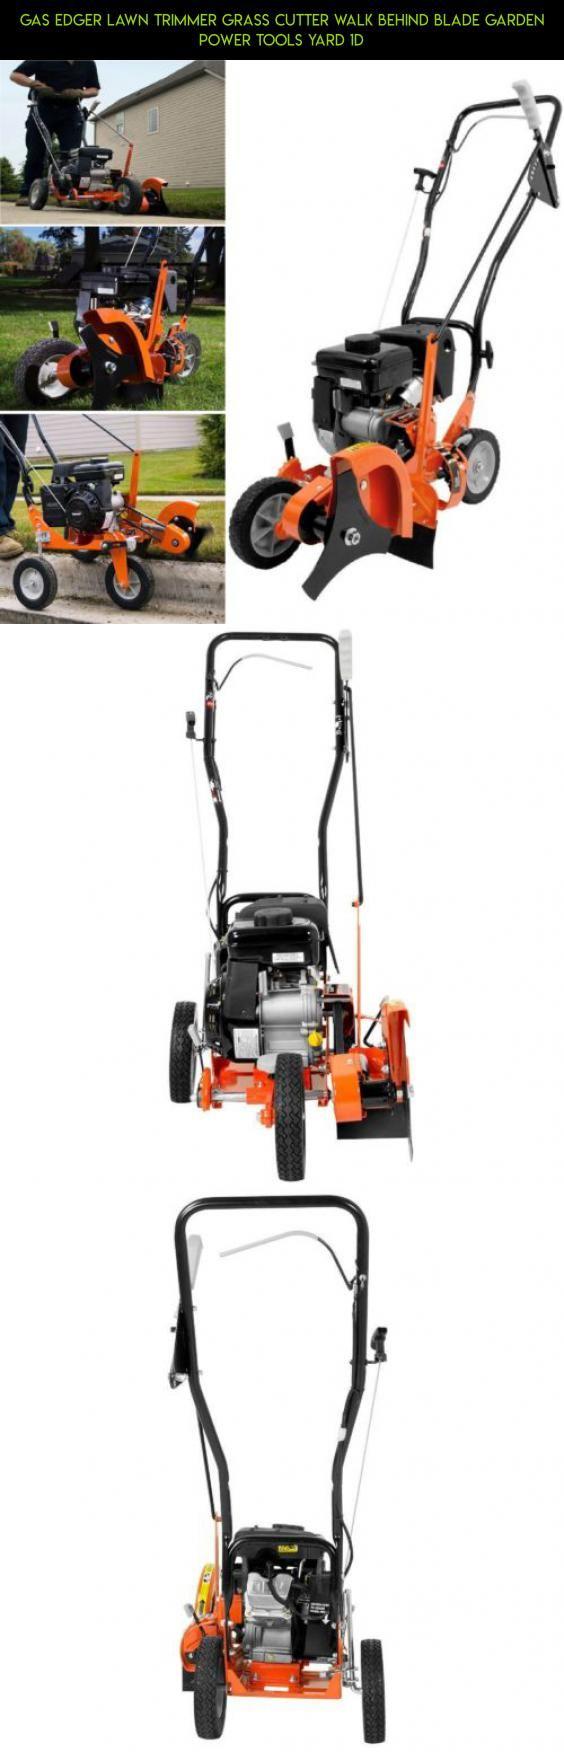 Gas Edger Lawn Trimmer Grass Cutter Walk Behind Blade Garden Power Tools Yard 1d #tech #drone #fpv #gardening #edger #kit #products #racing #camera #parts #plans #technology #shopping #gadgets